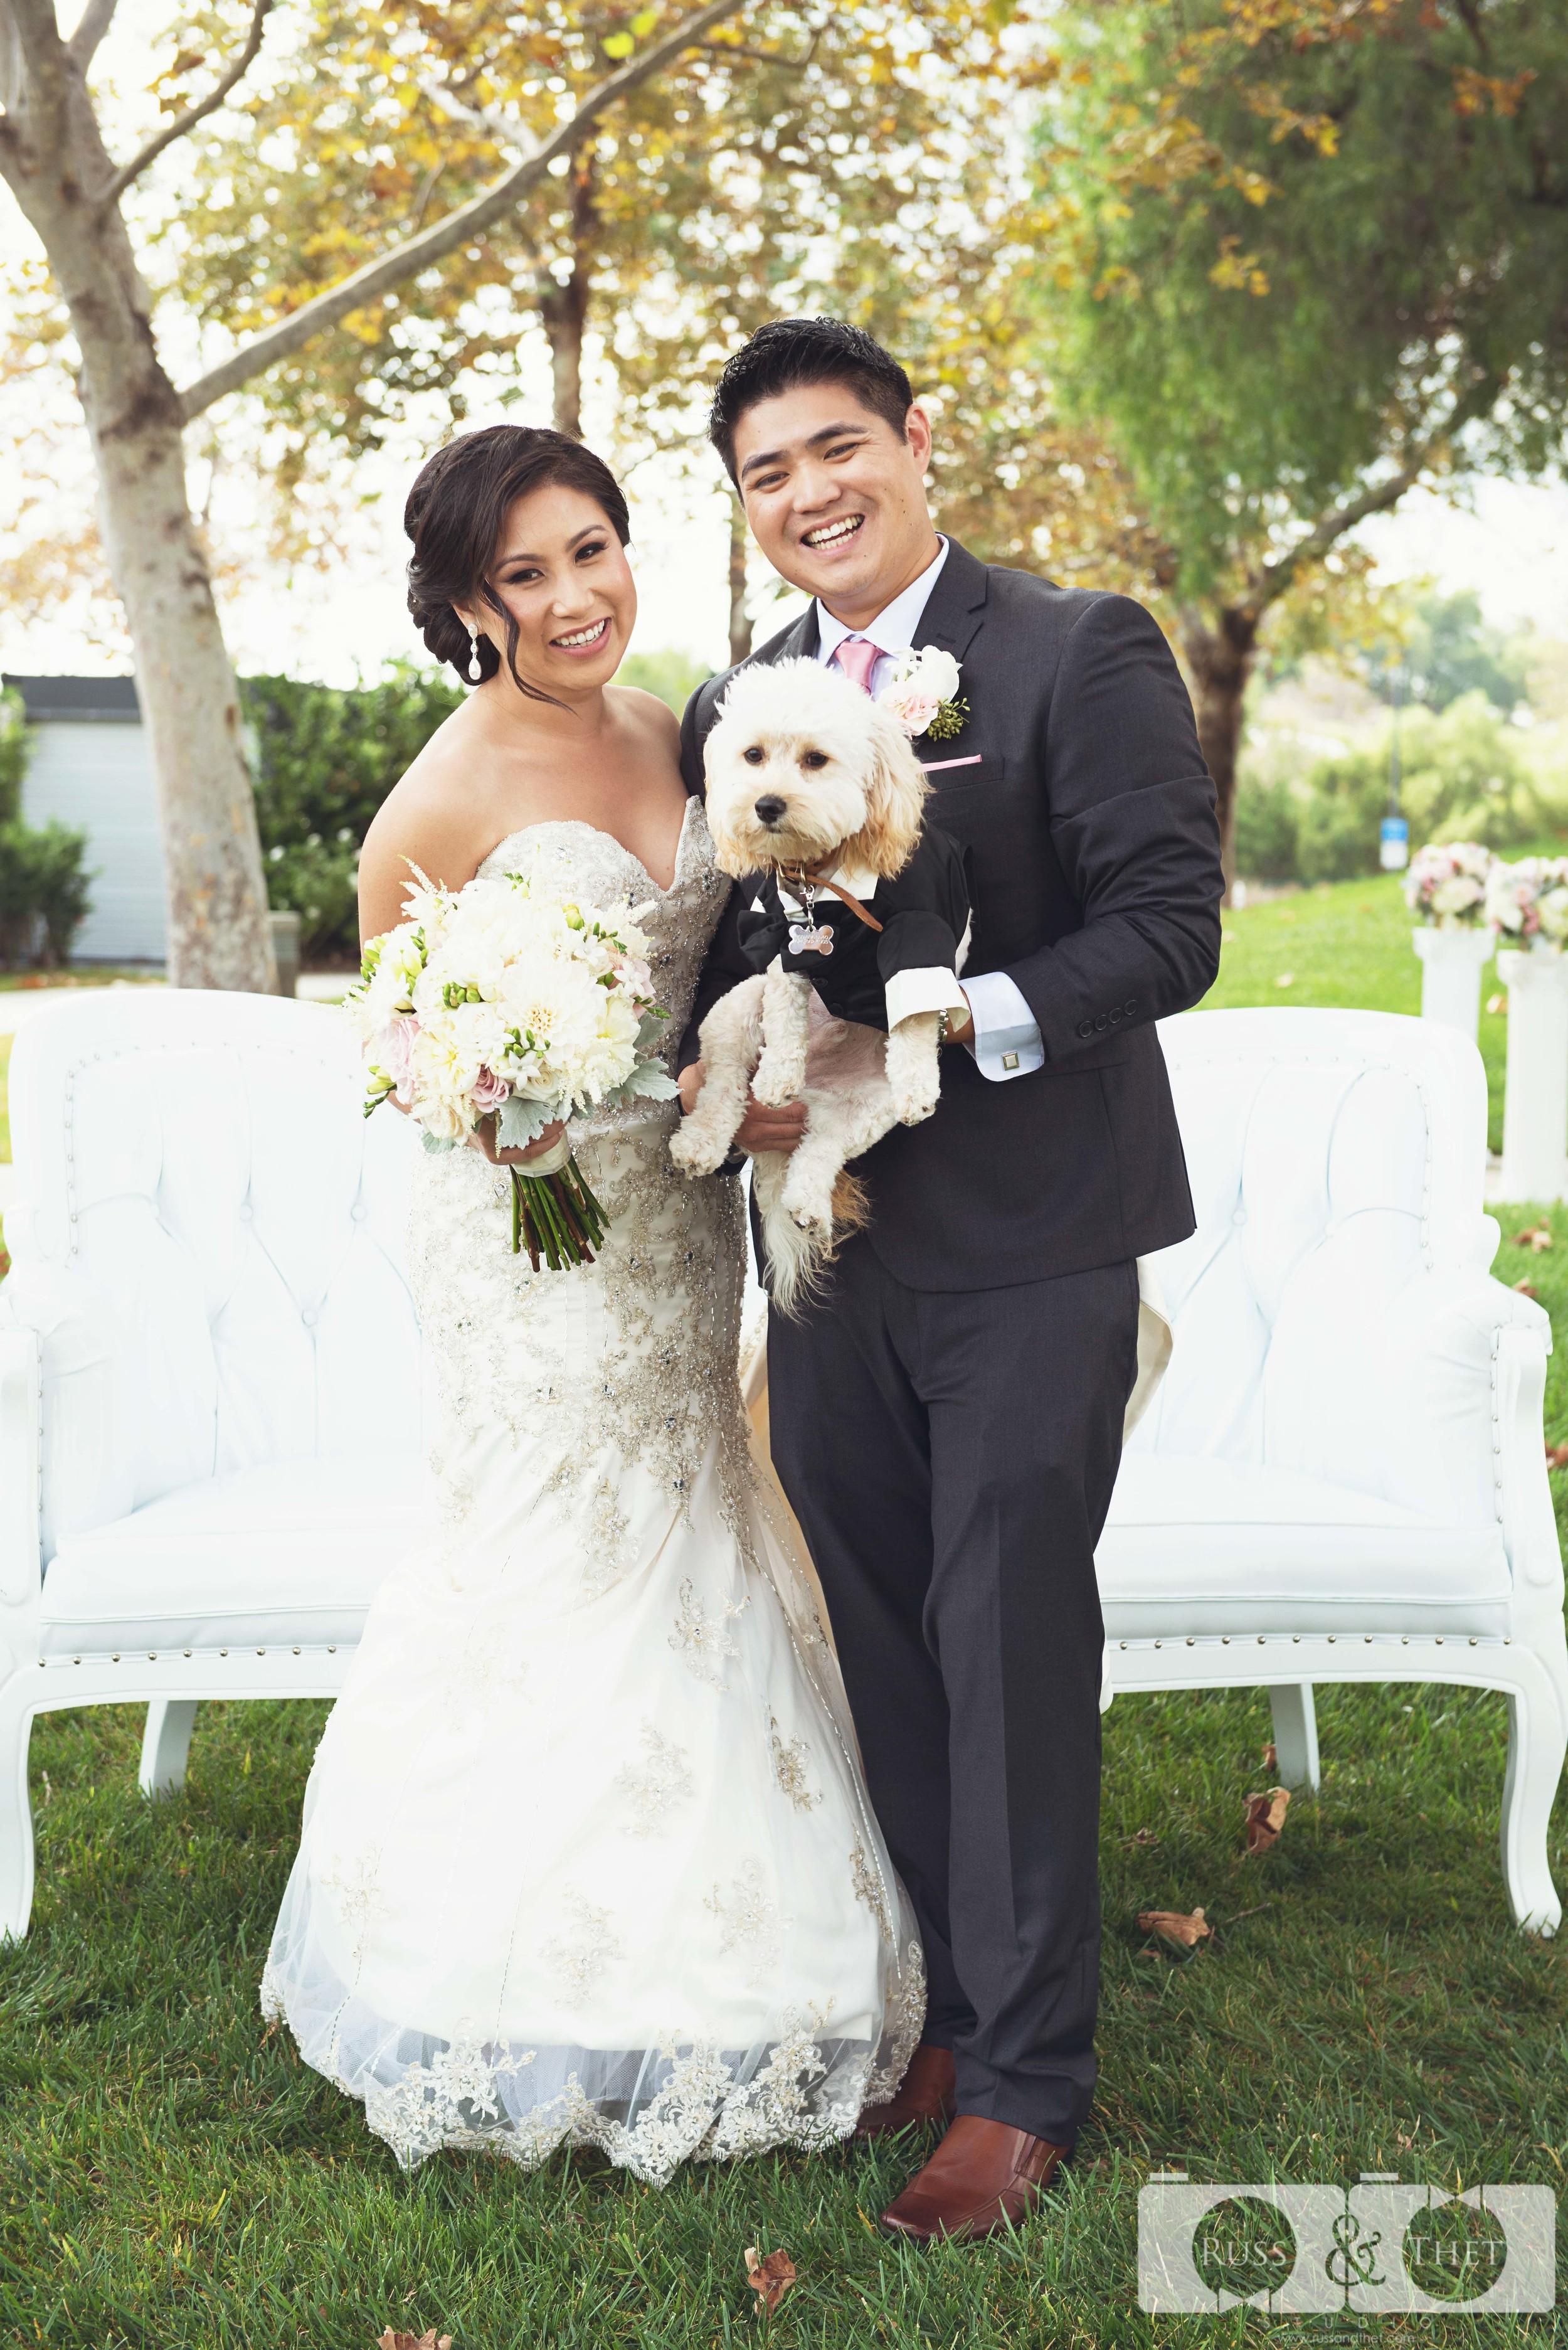 summit-house-fullerton-wedding-photographer-53.JPG